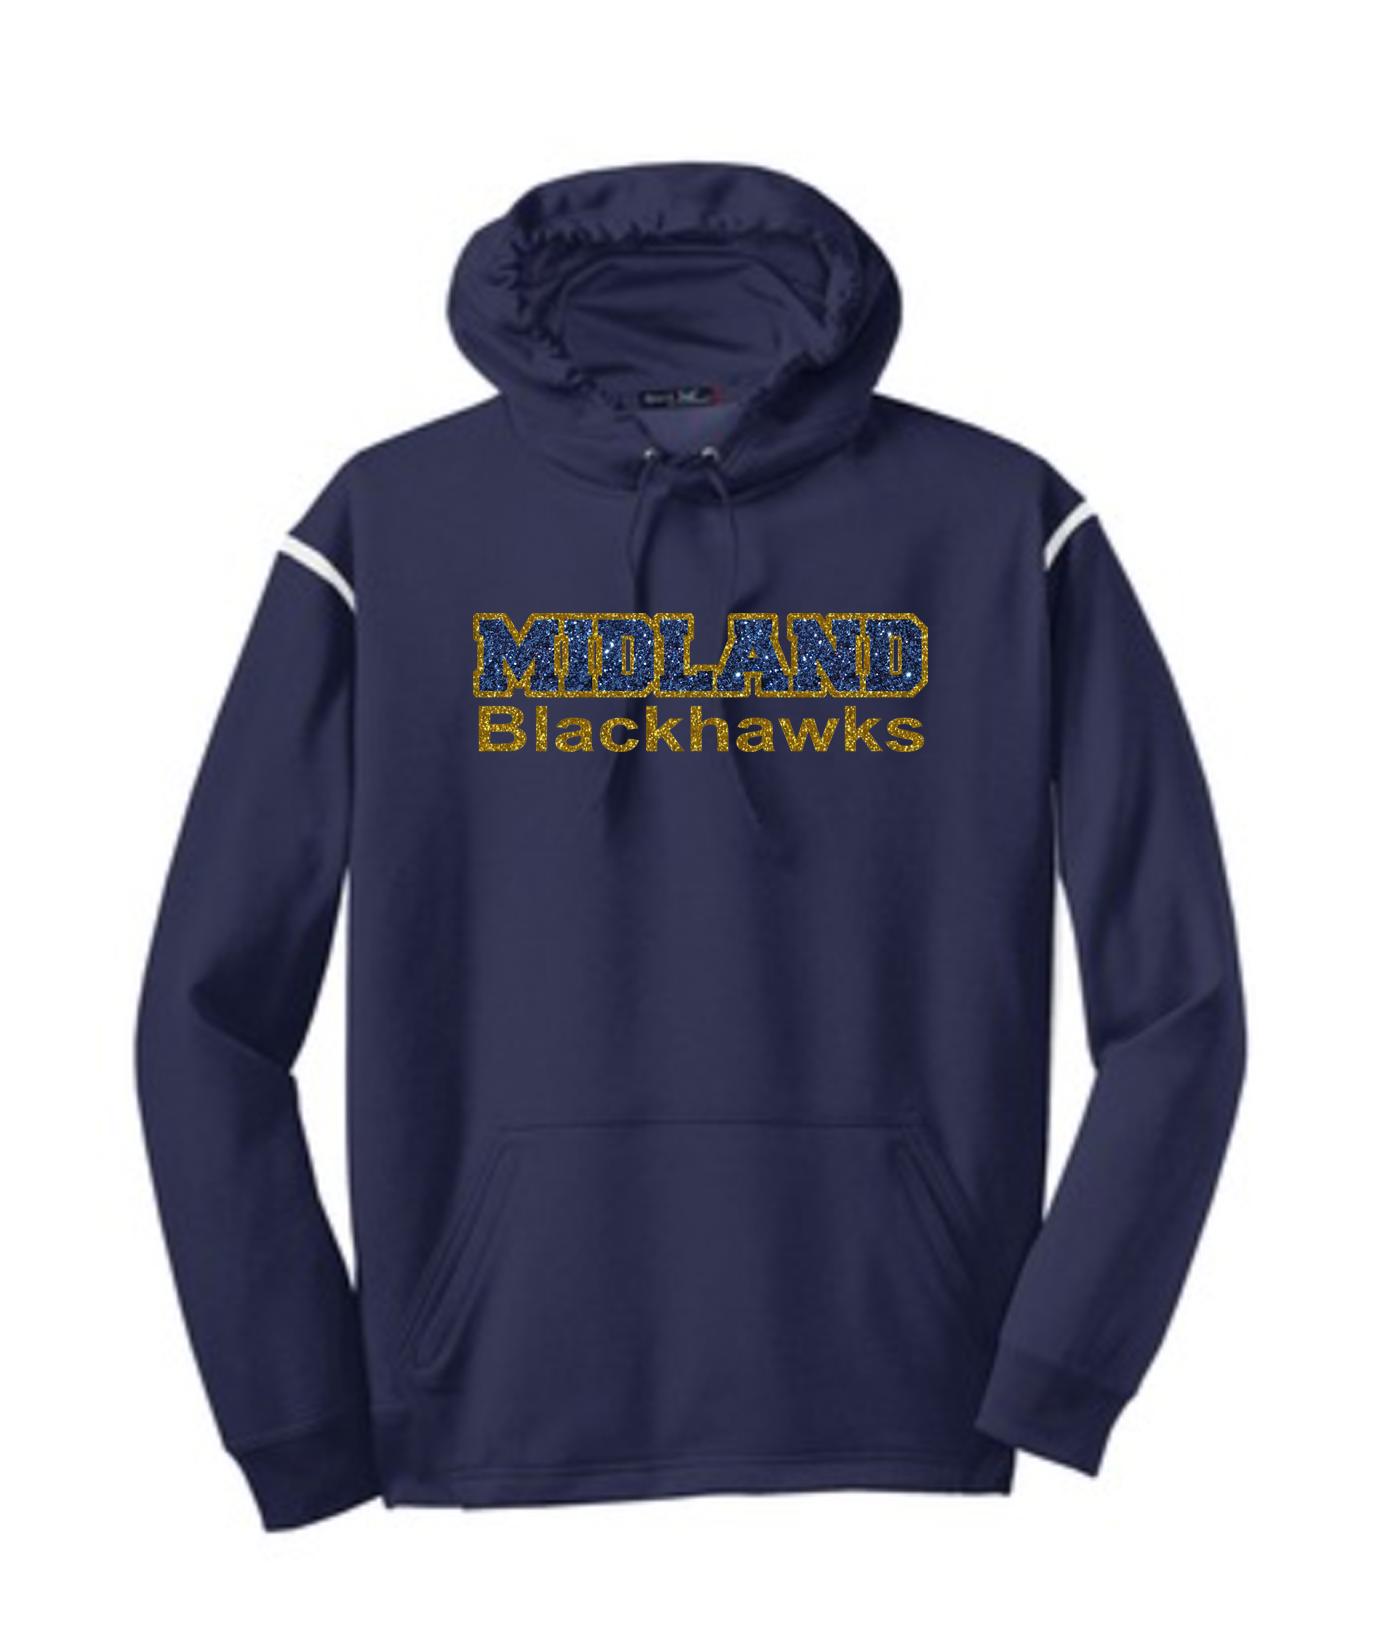 Sport-Tek Navy Tech Fleece Colorblock Hooded Sweatshirt Glitter Midland Blackhawks Gold Outline Navy Inside